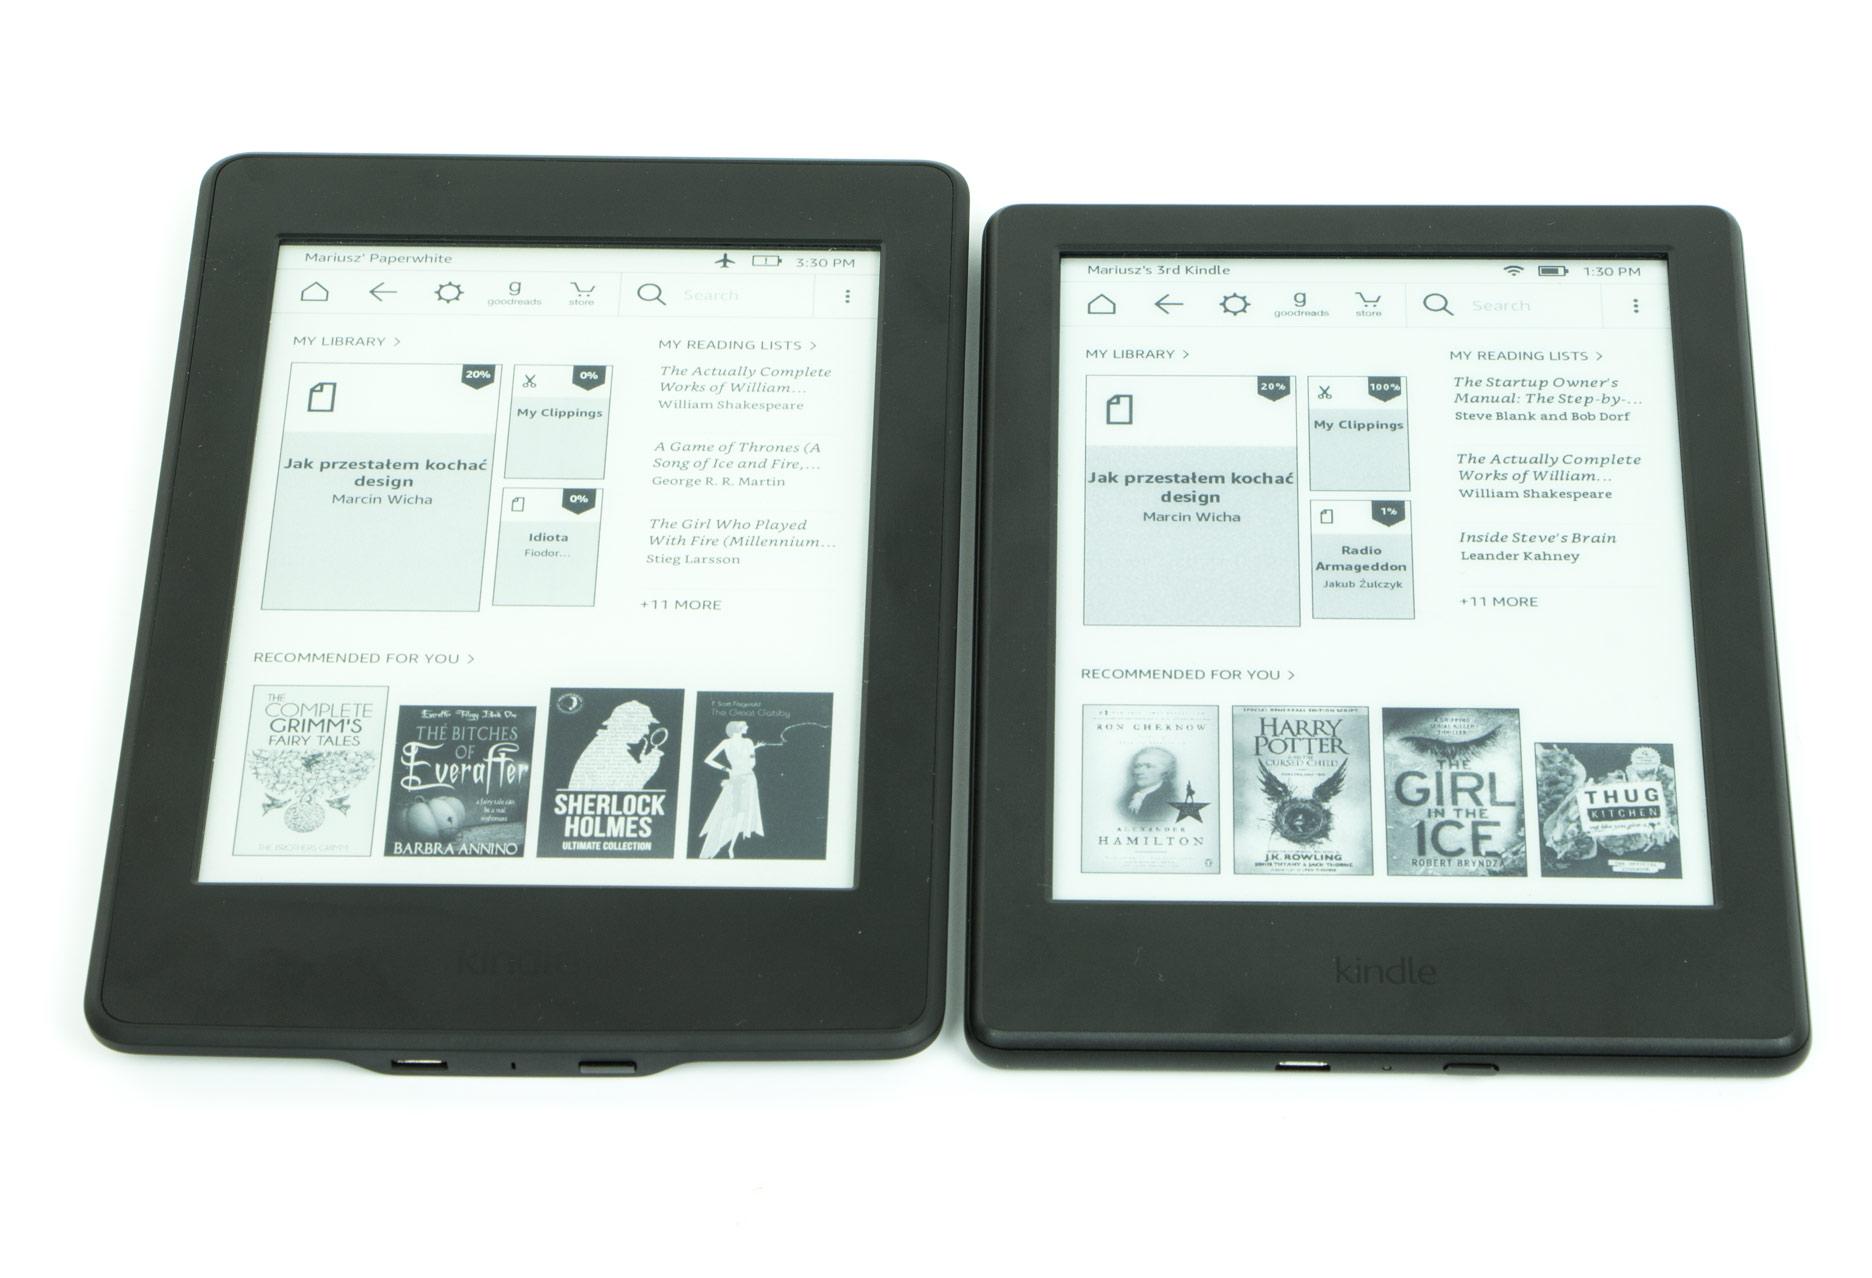 porównanie Kindle 8 obok Paperwhite 3 ekran główny